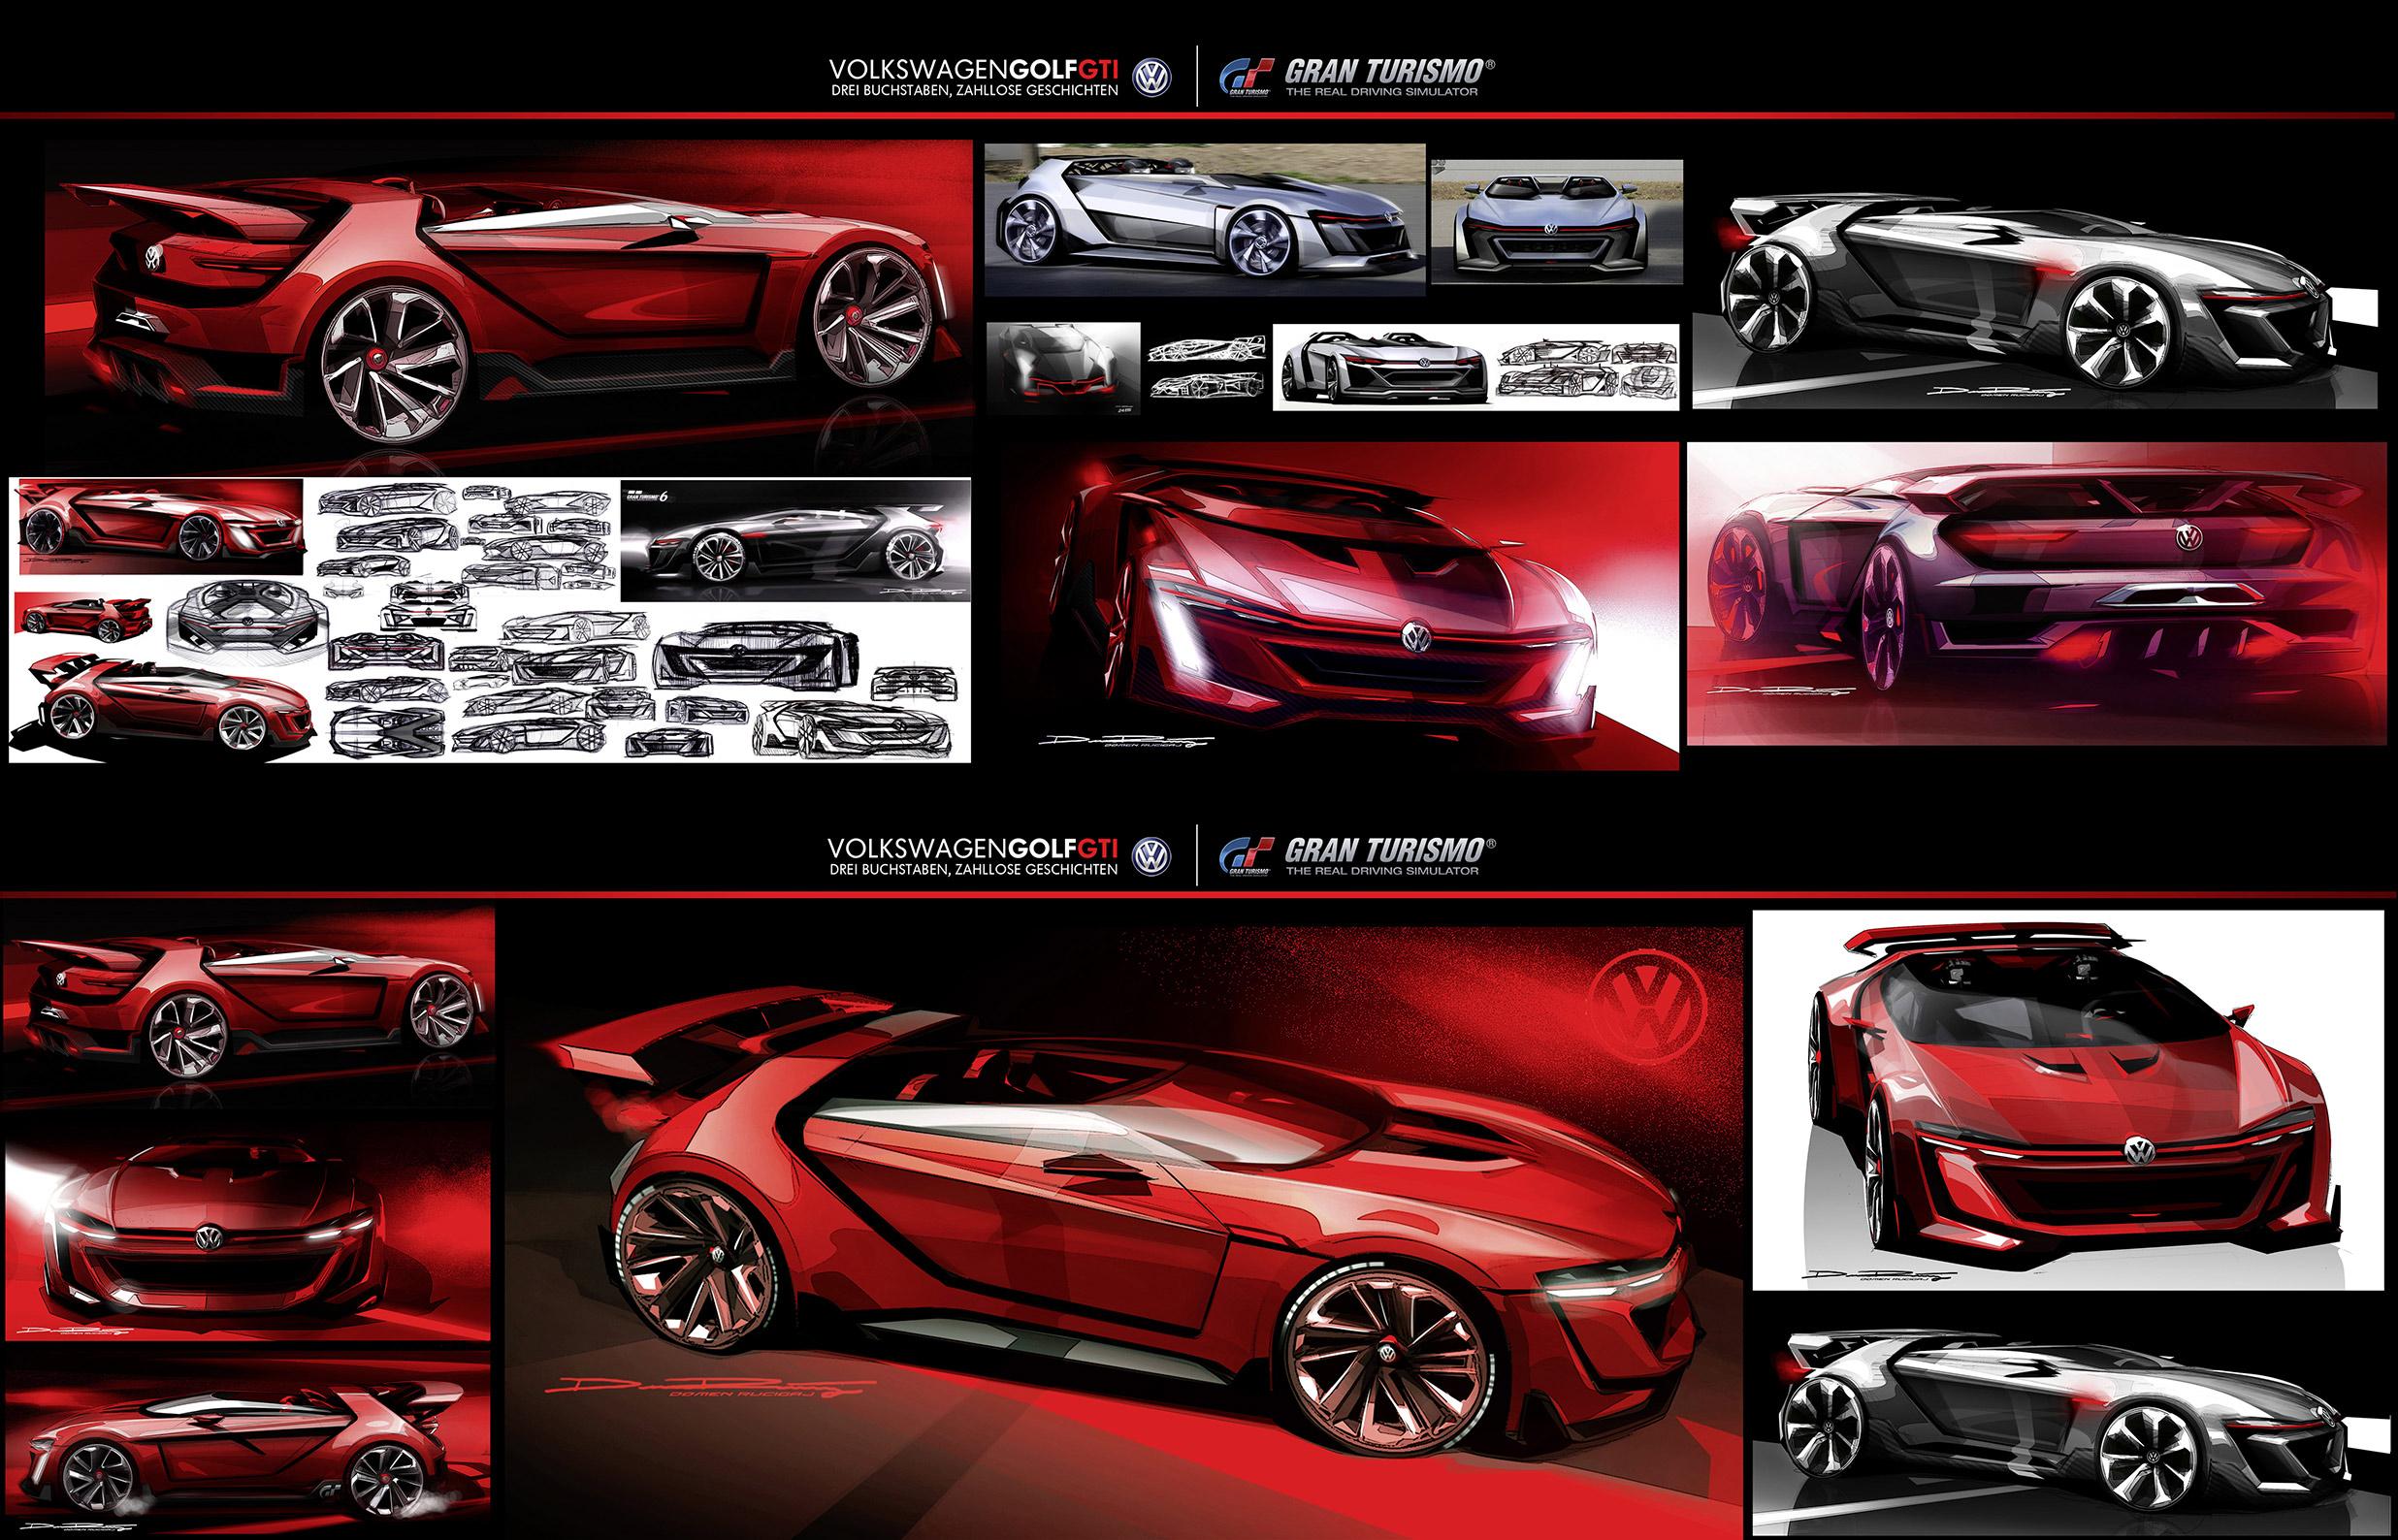 volkswagen-design-vision-gti-gran-turismo-006